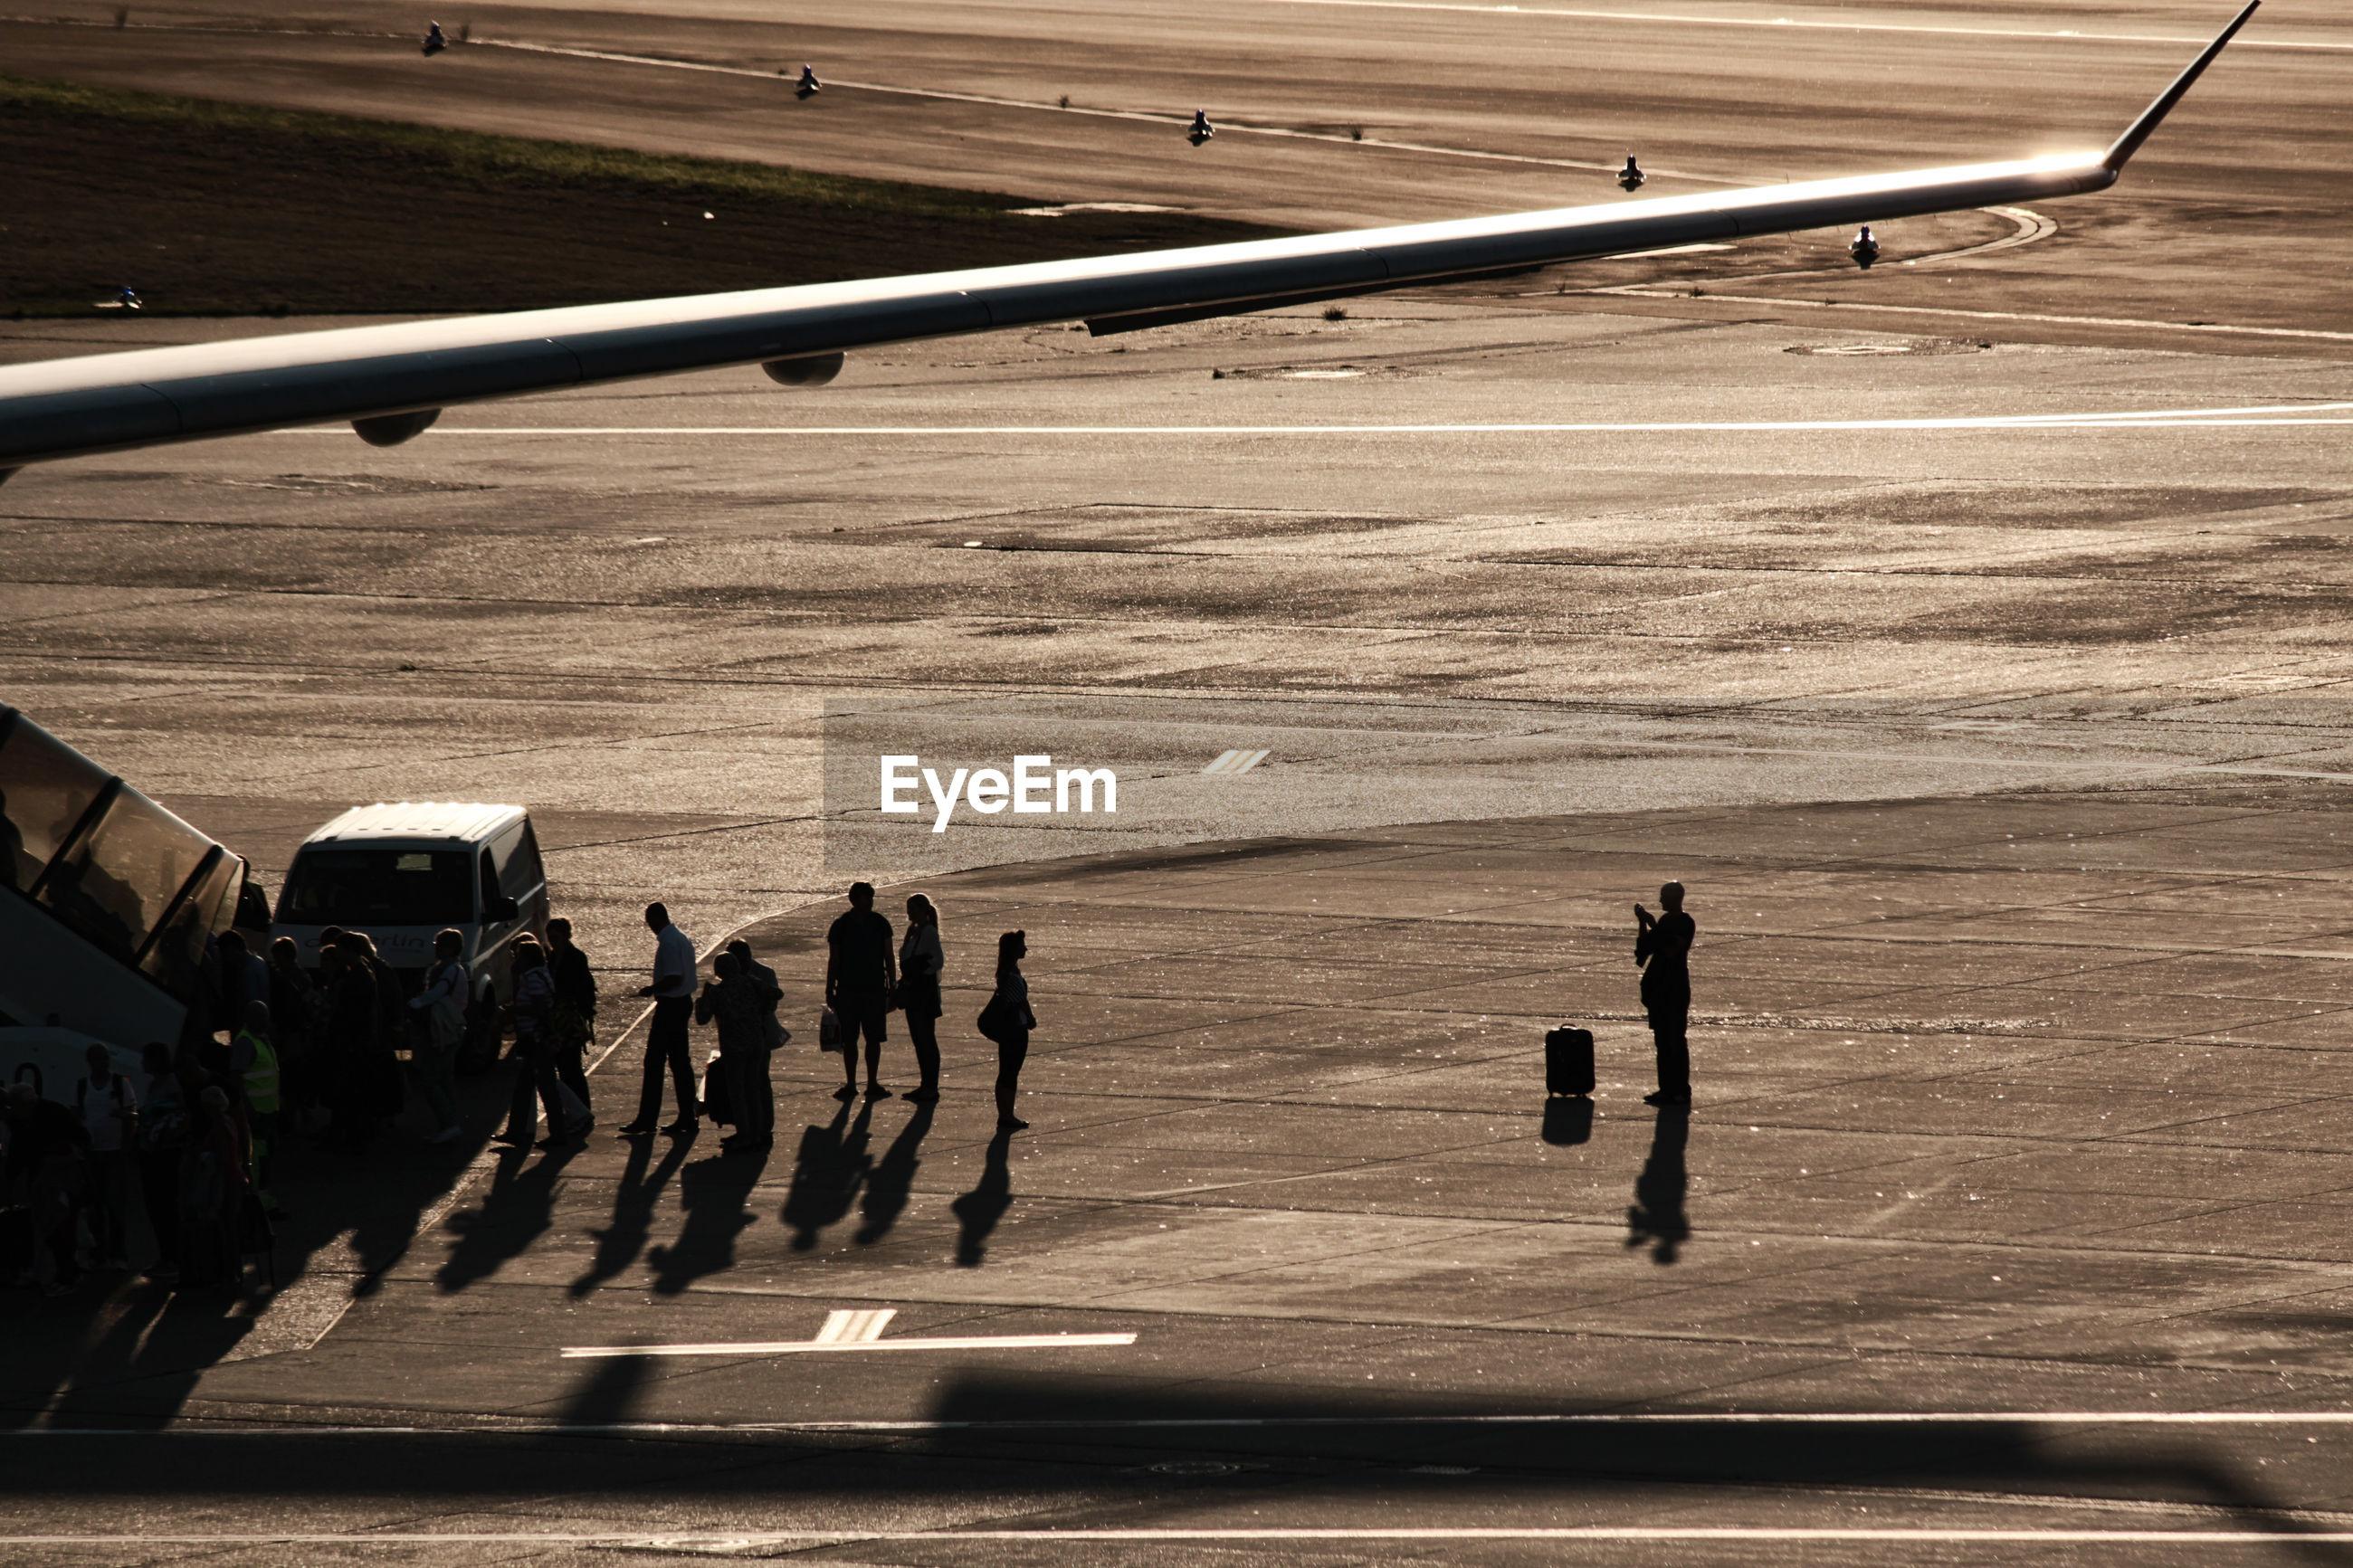 People at airport runway